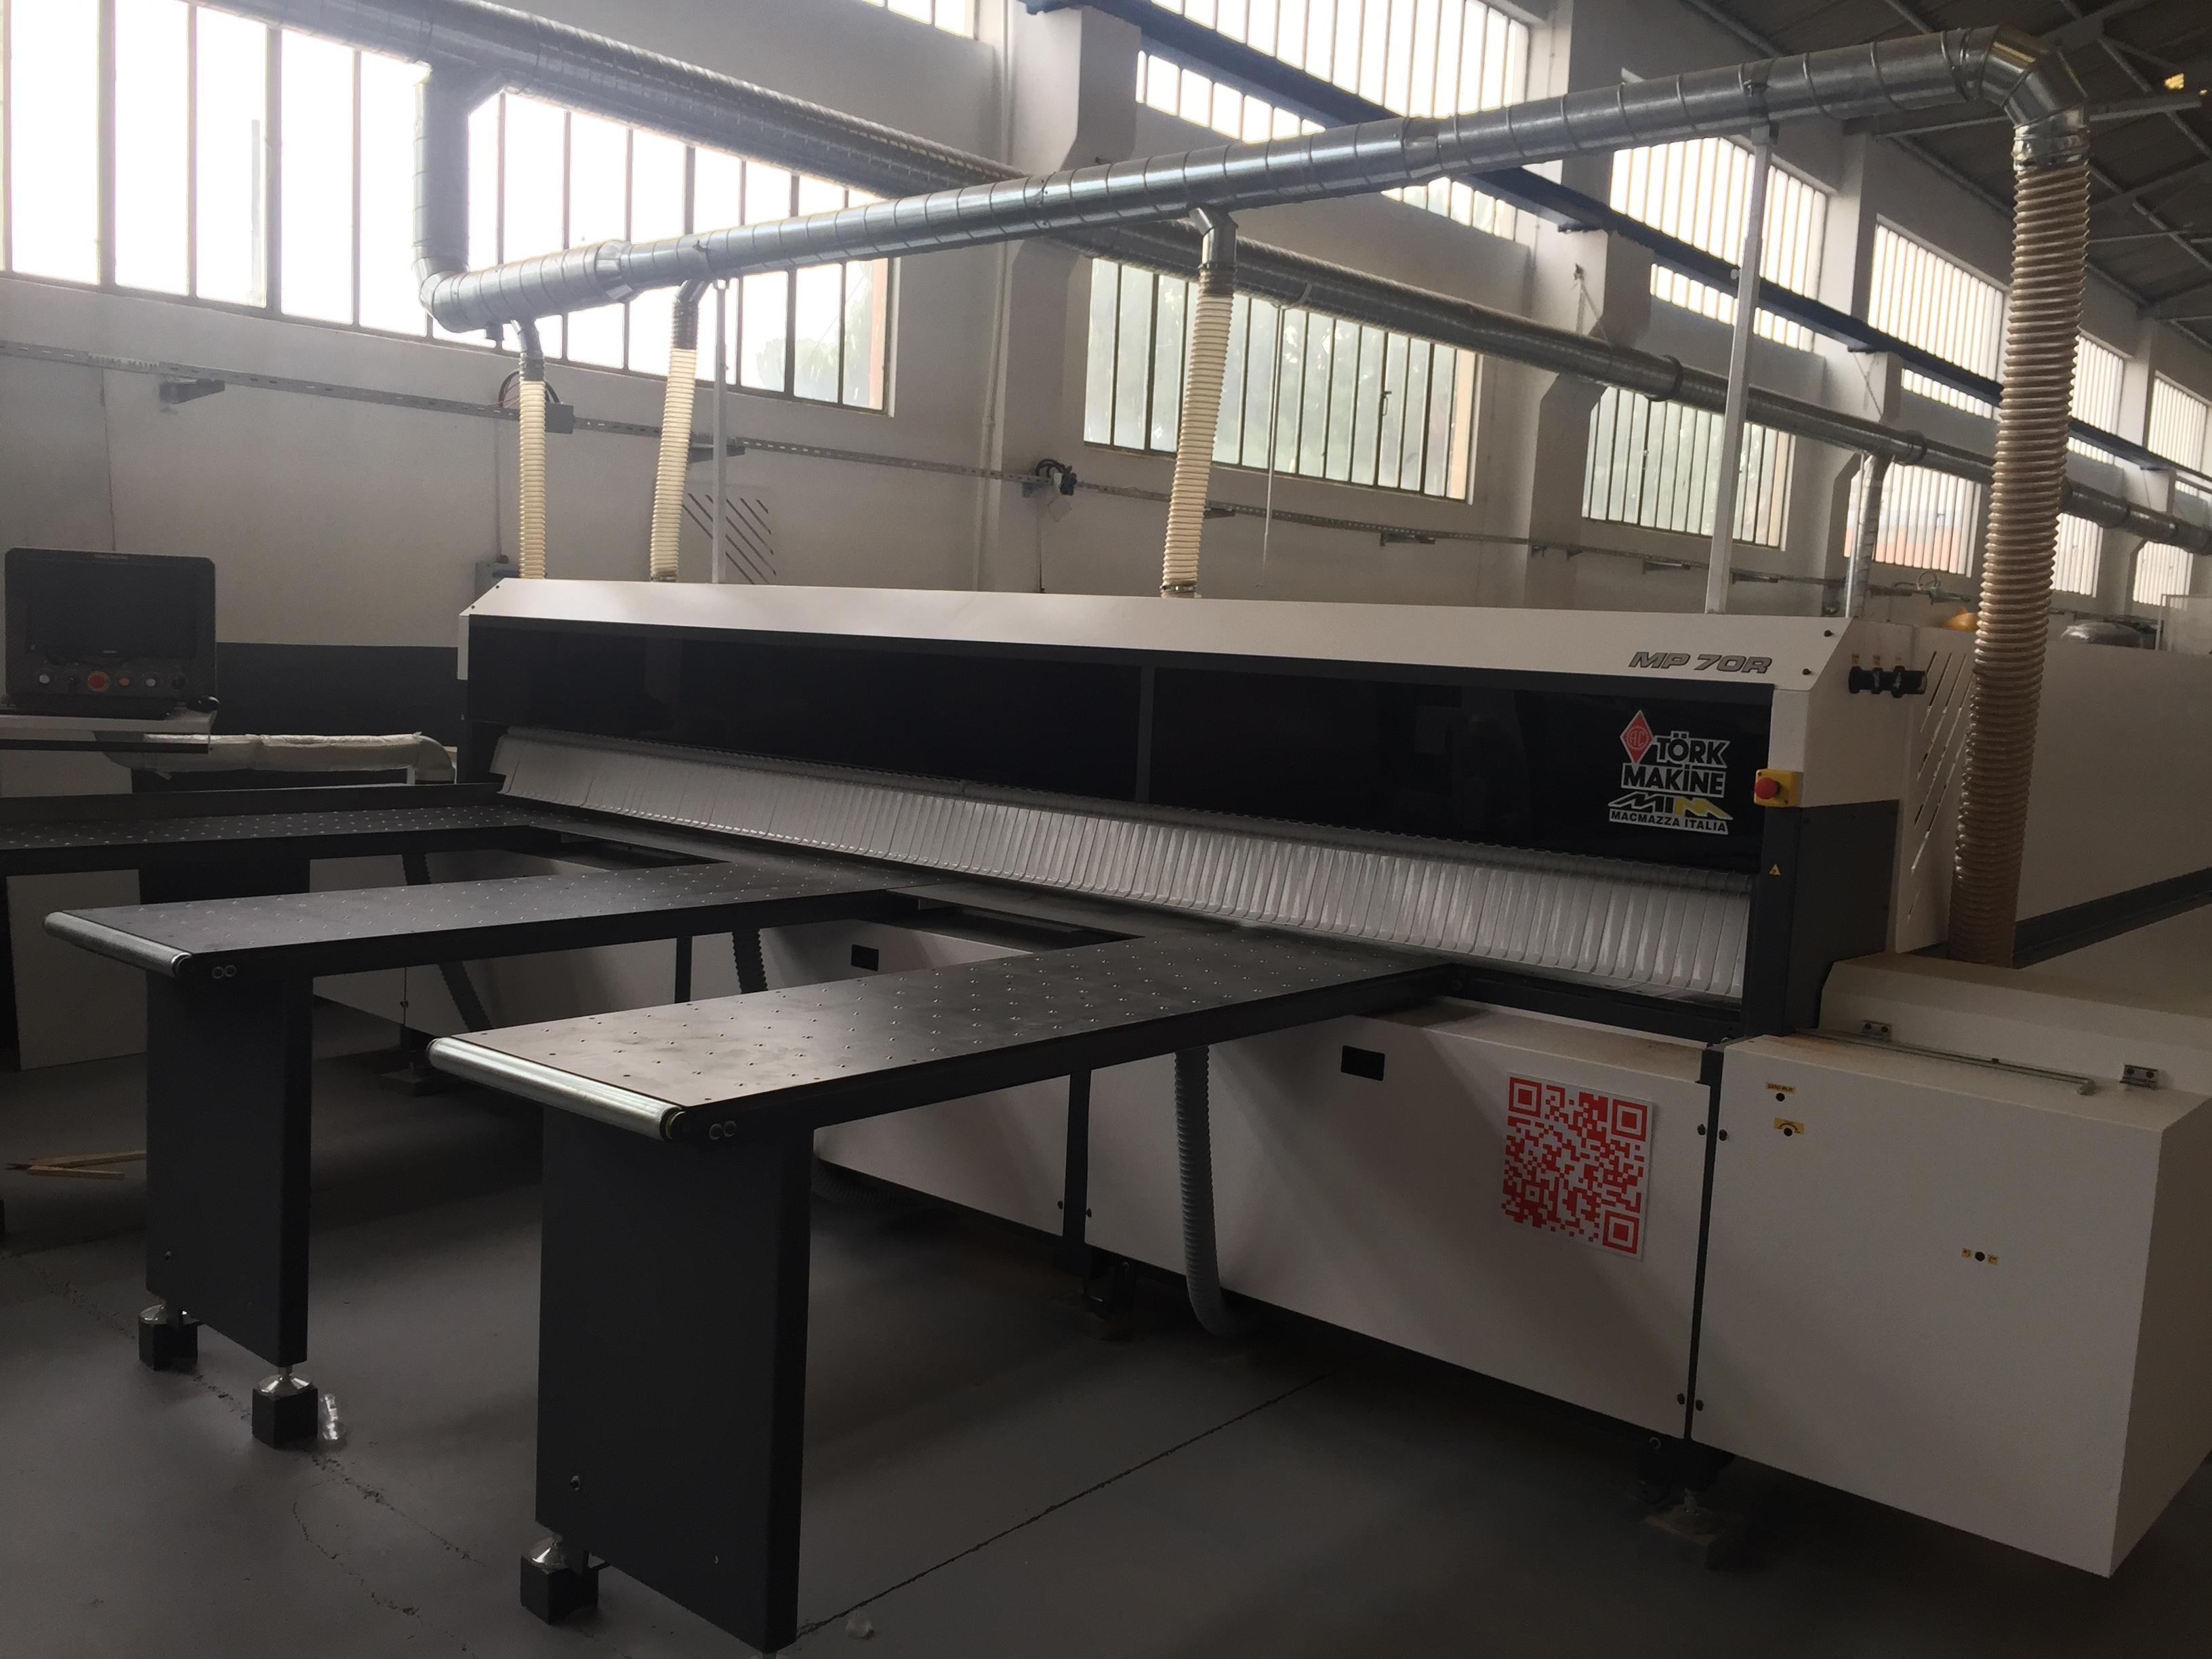 MASTERPANEL MP70 Panel Saw Machine - Exapro